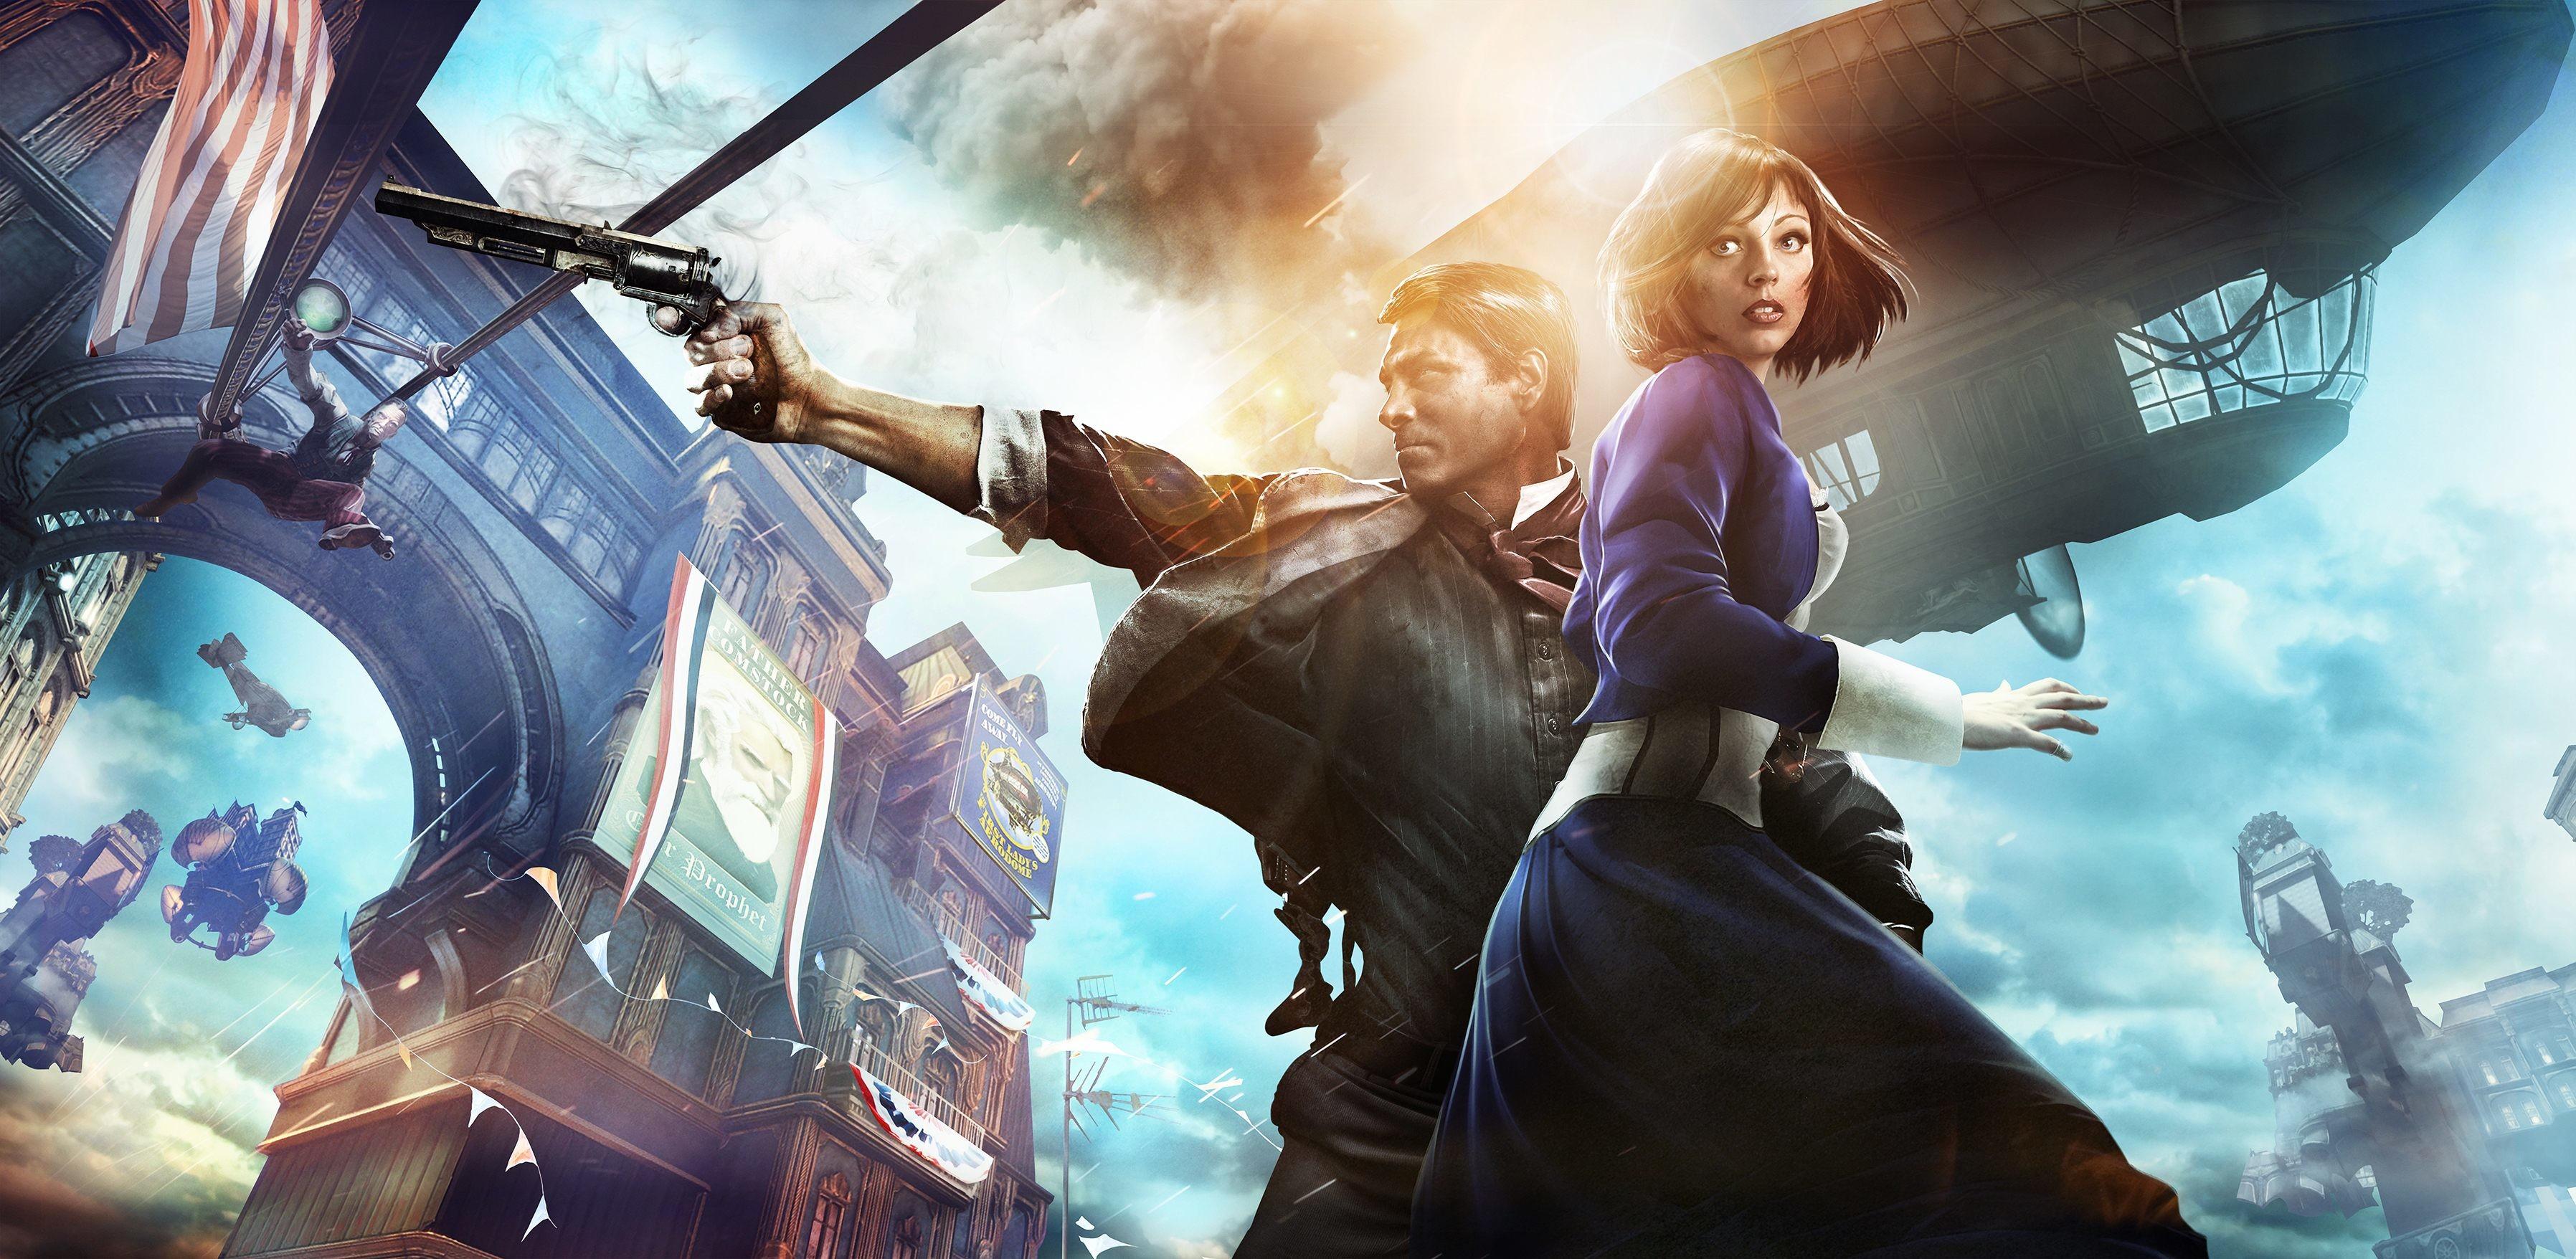 HD Wallpaper | Background ID:338154. Video Game Bioshock Infinite.  29 Like